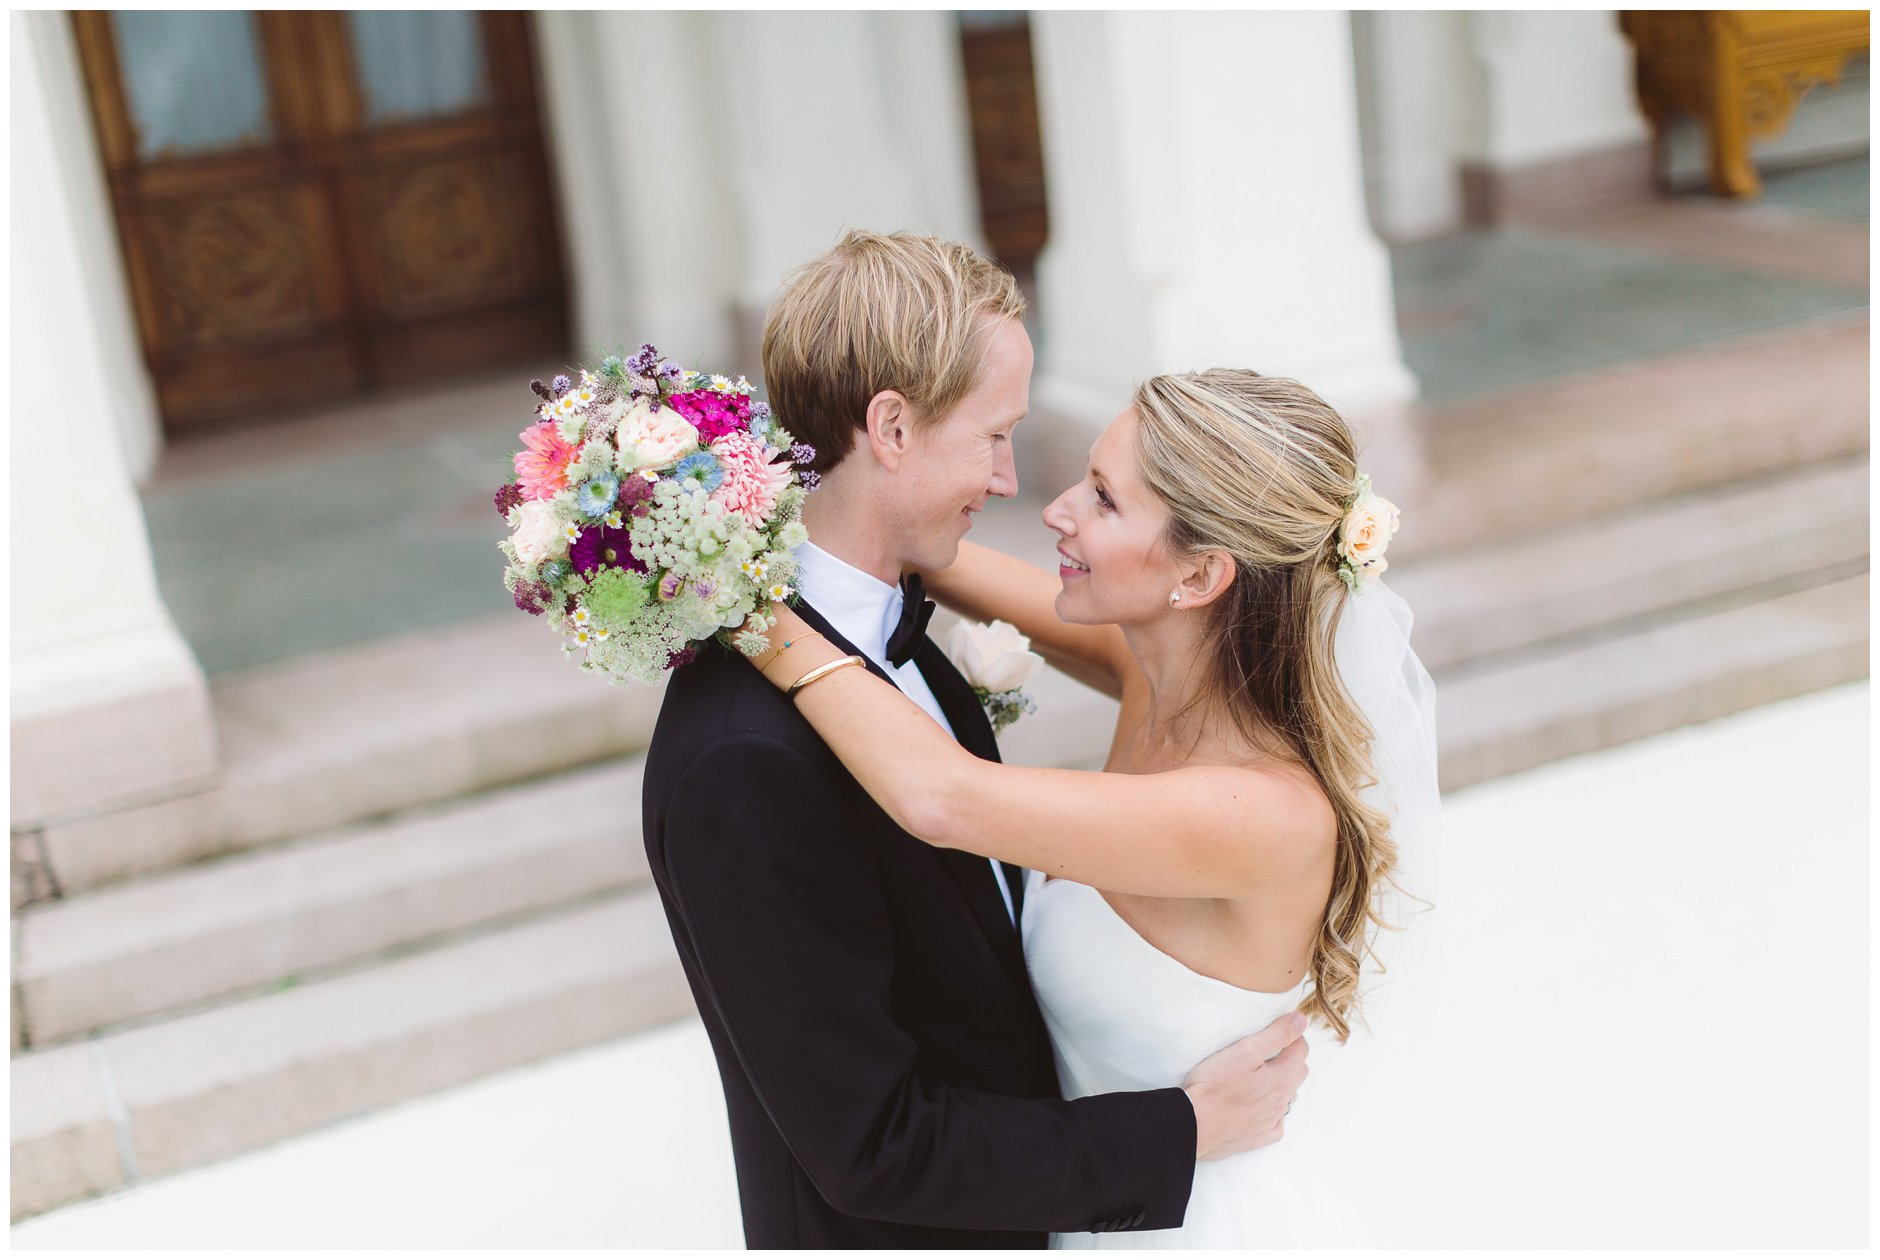 Bryllup Oscarshall Bygdøy og Villa Eckbo